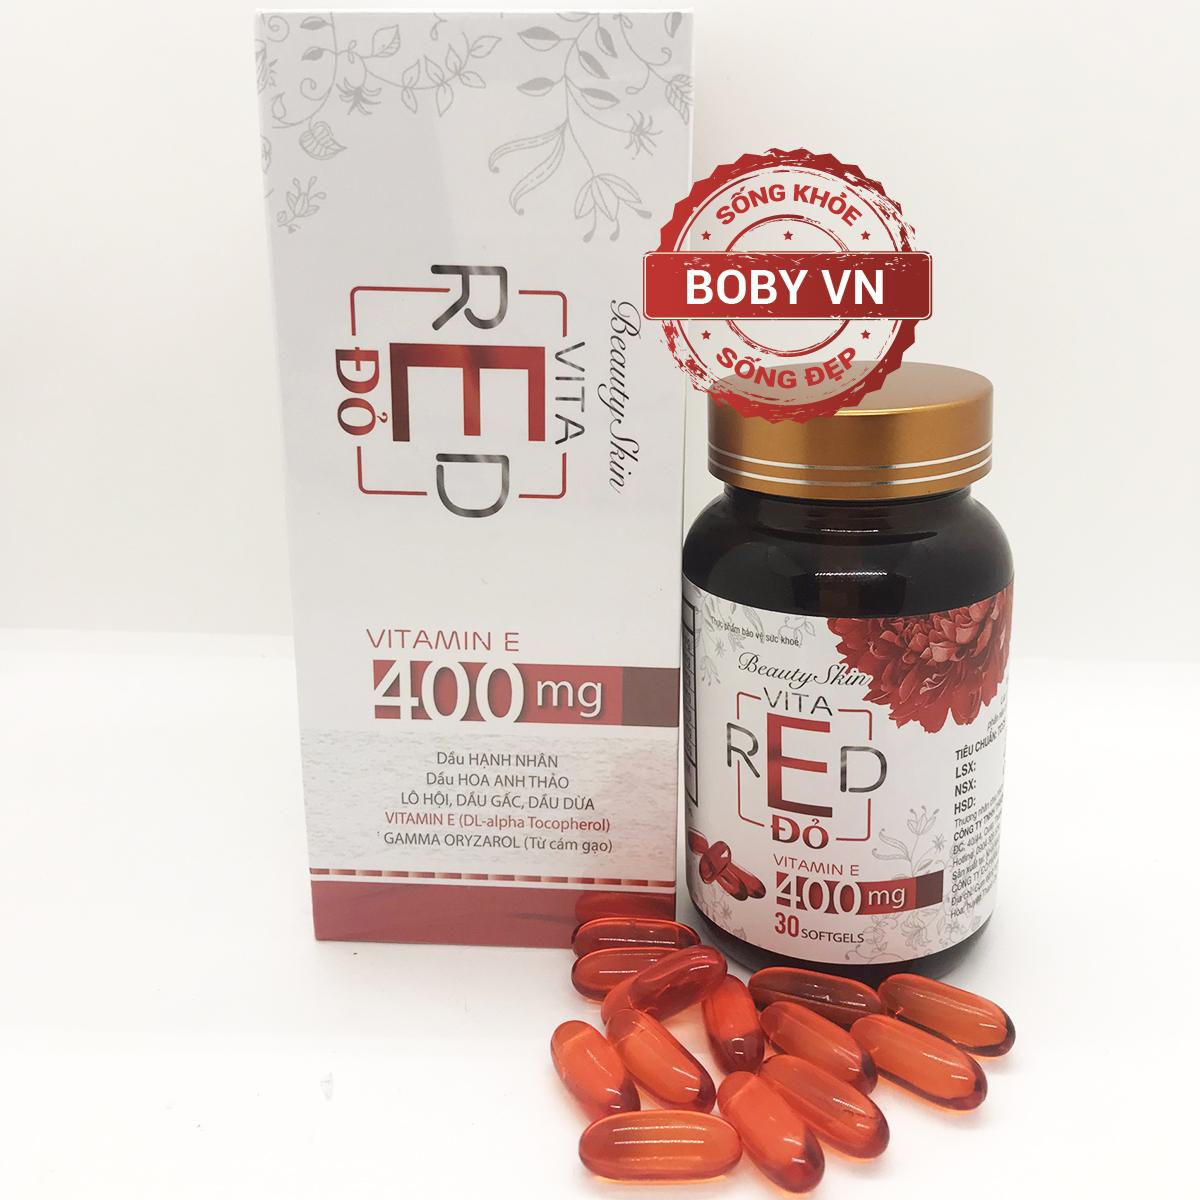 Vitamin E Đỏ 400mg - Beauty Skin Vita Red (Lọ 30 viên)